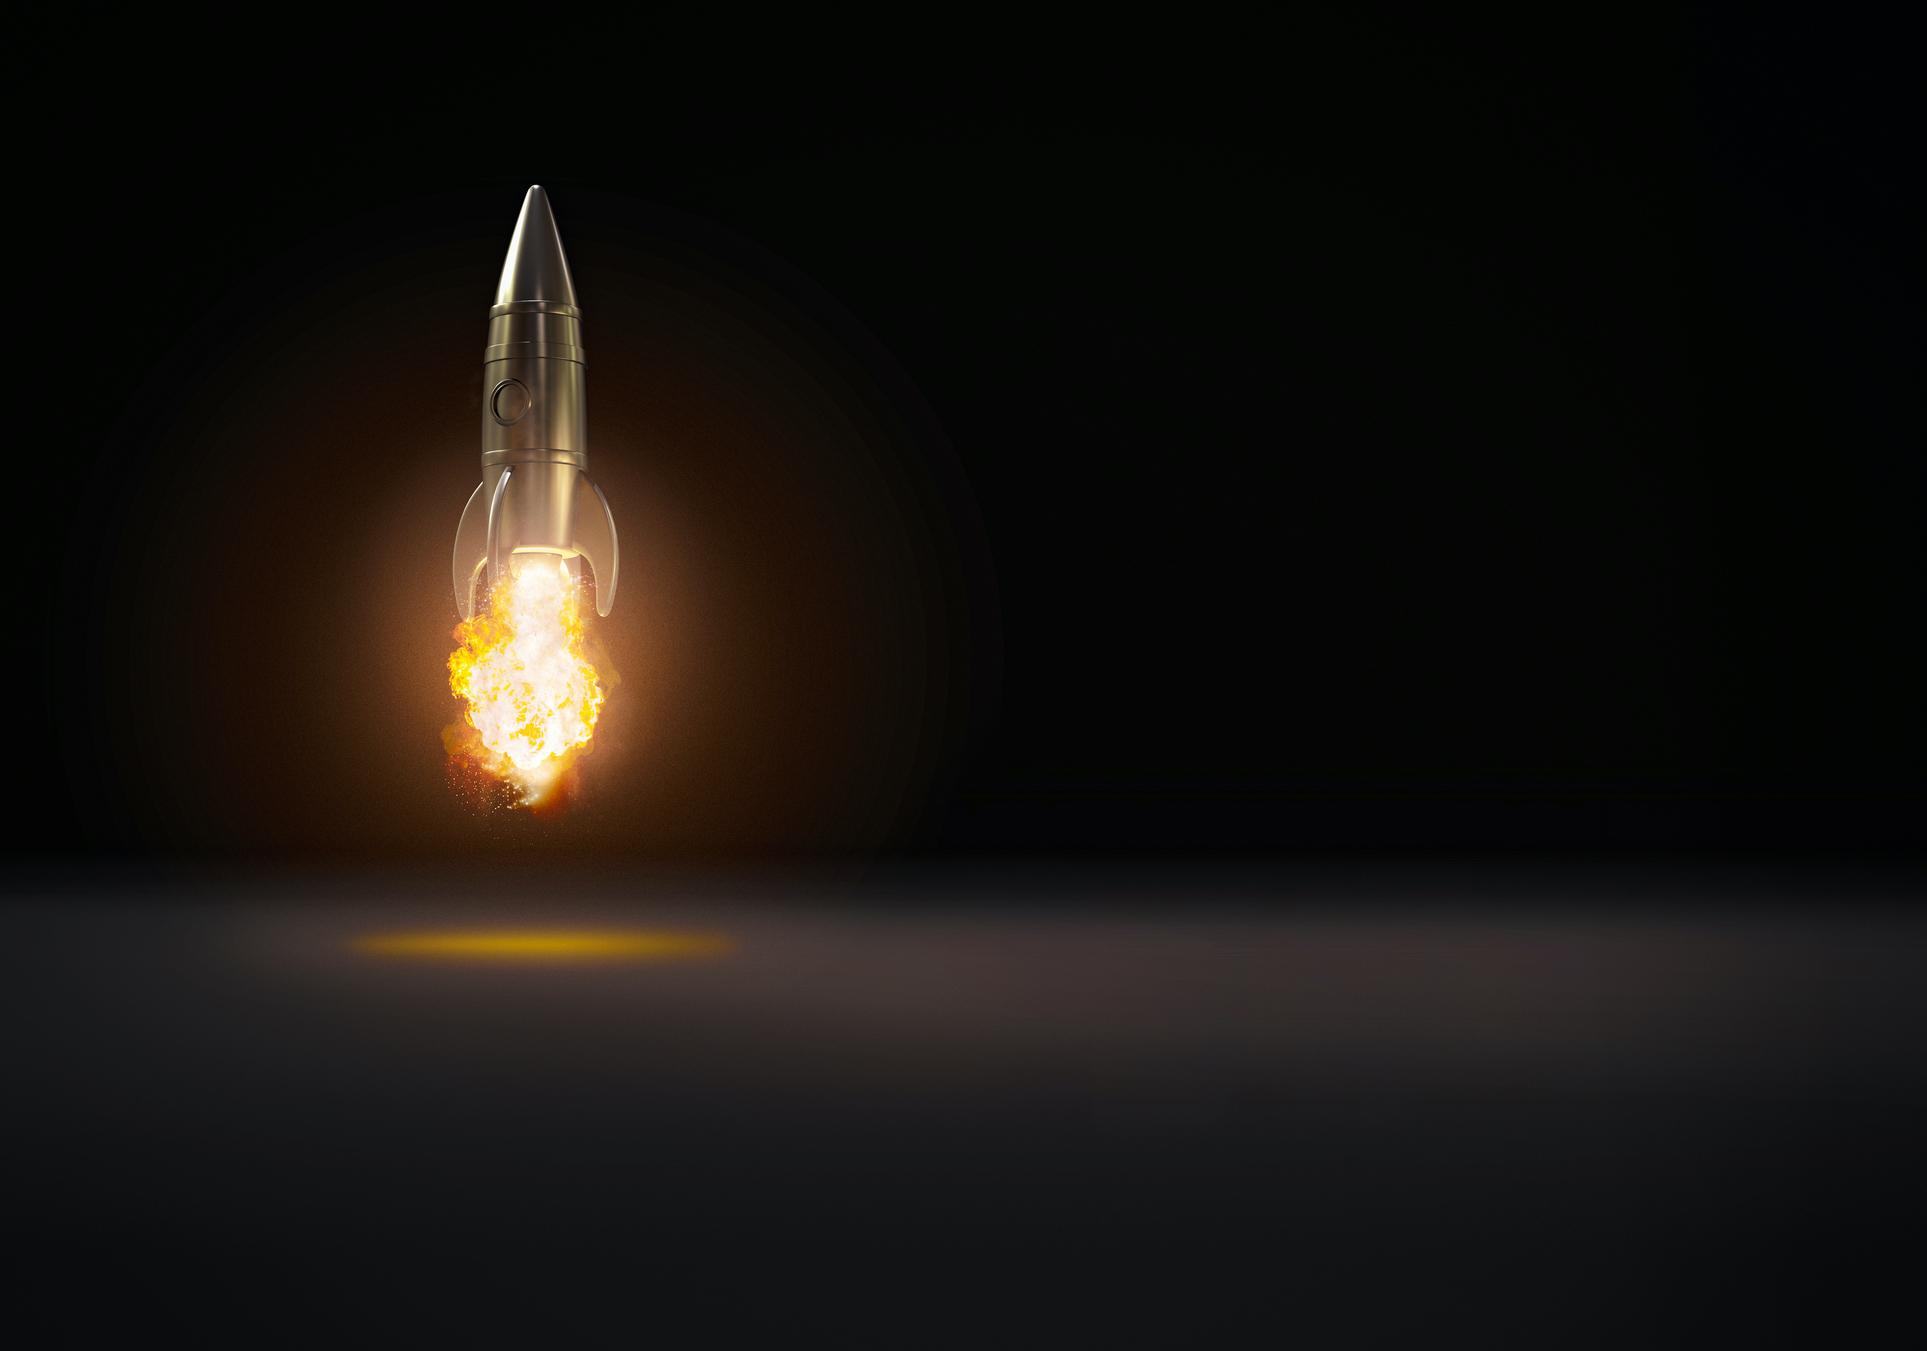 Rocket taking off